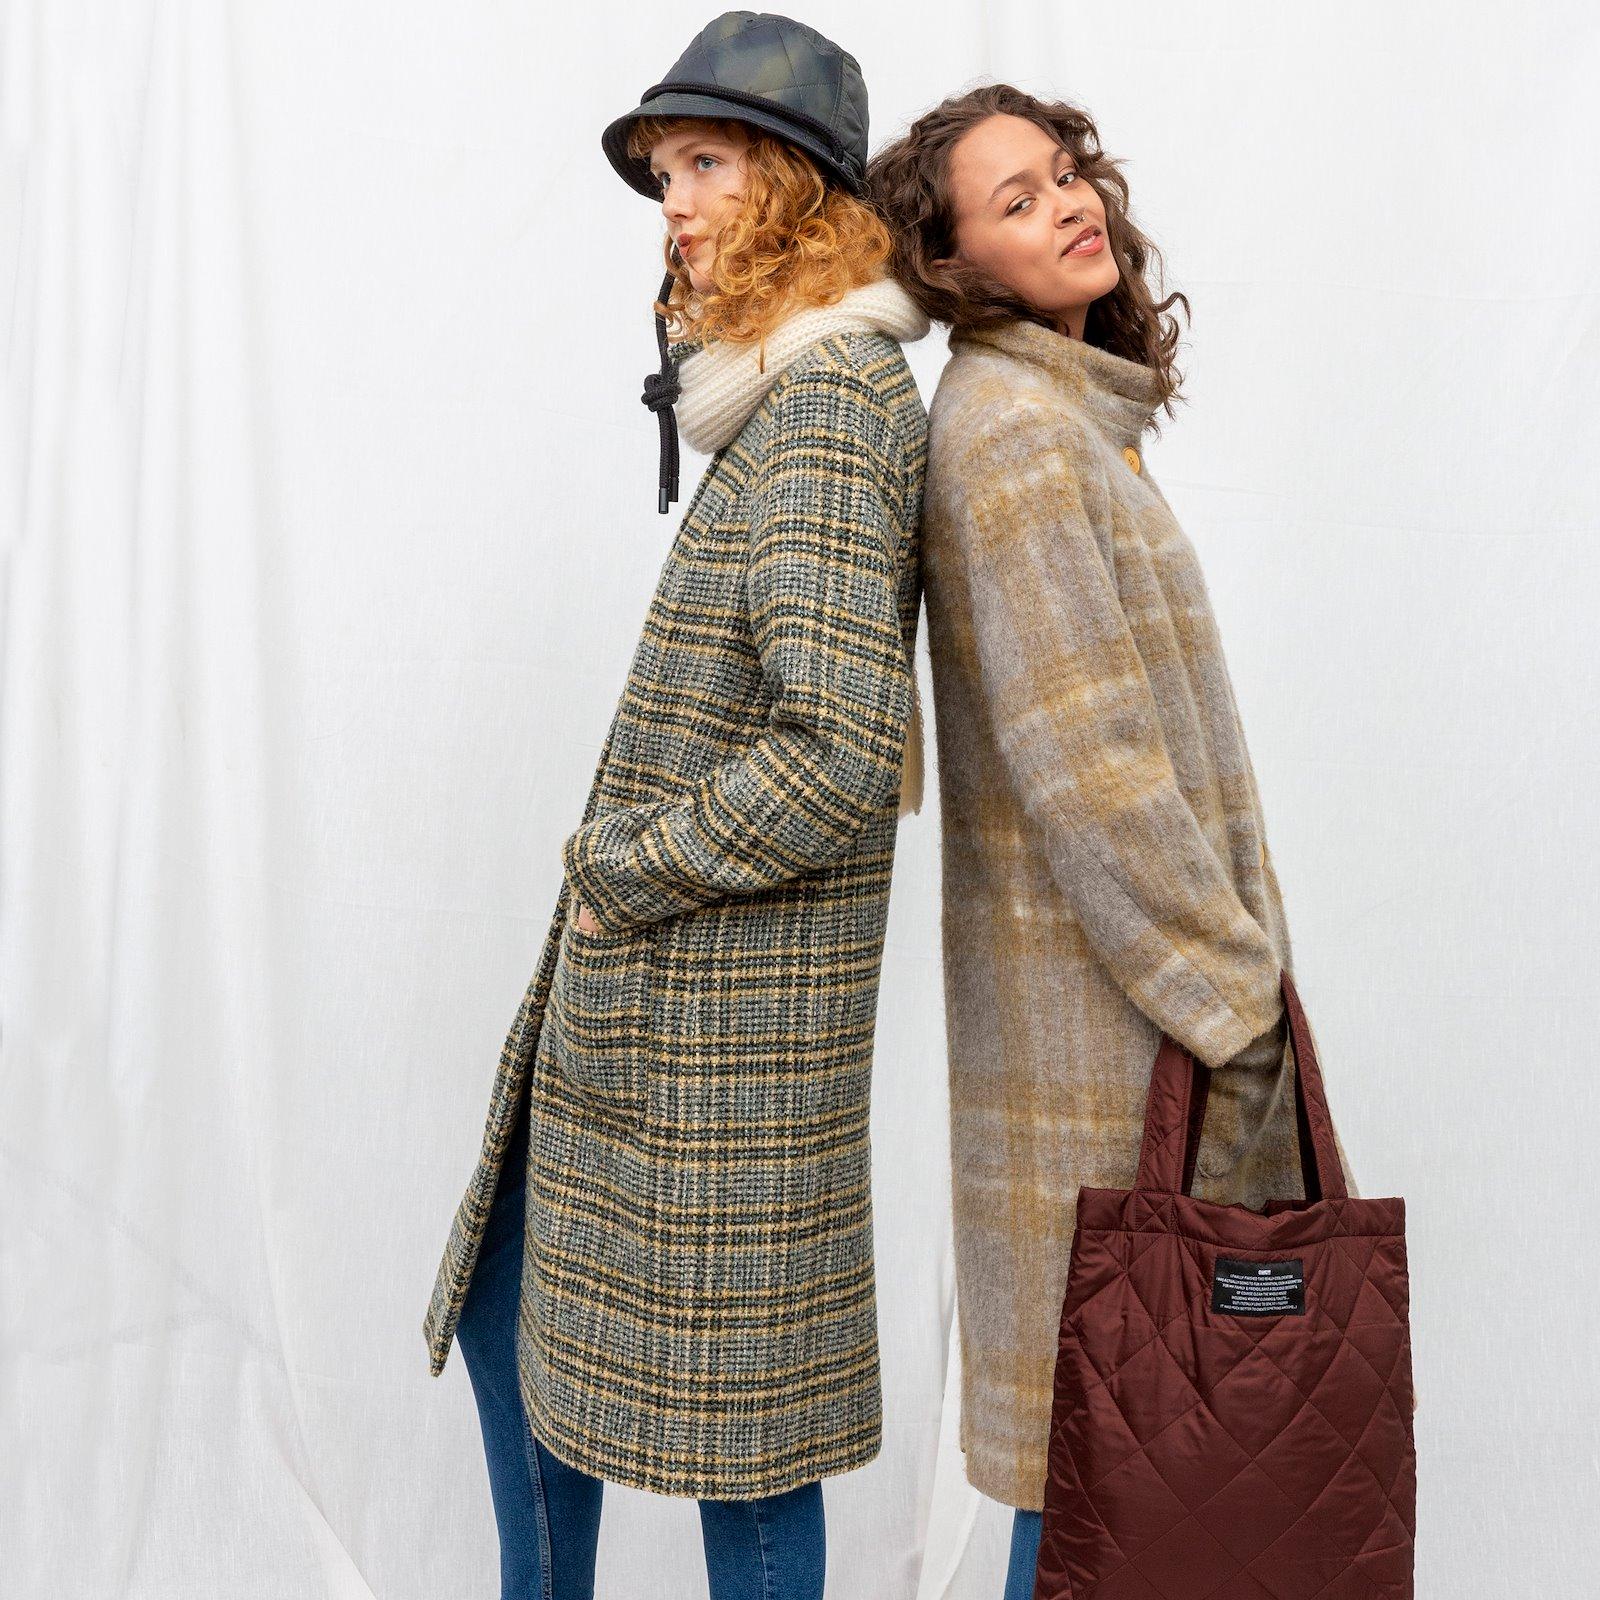 Wool felt grey/beige melange check 310363_DIY7009_920234_26533_bundle